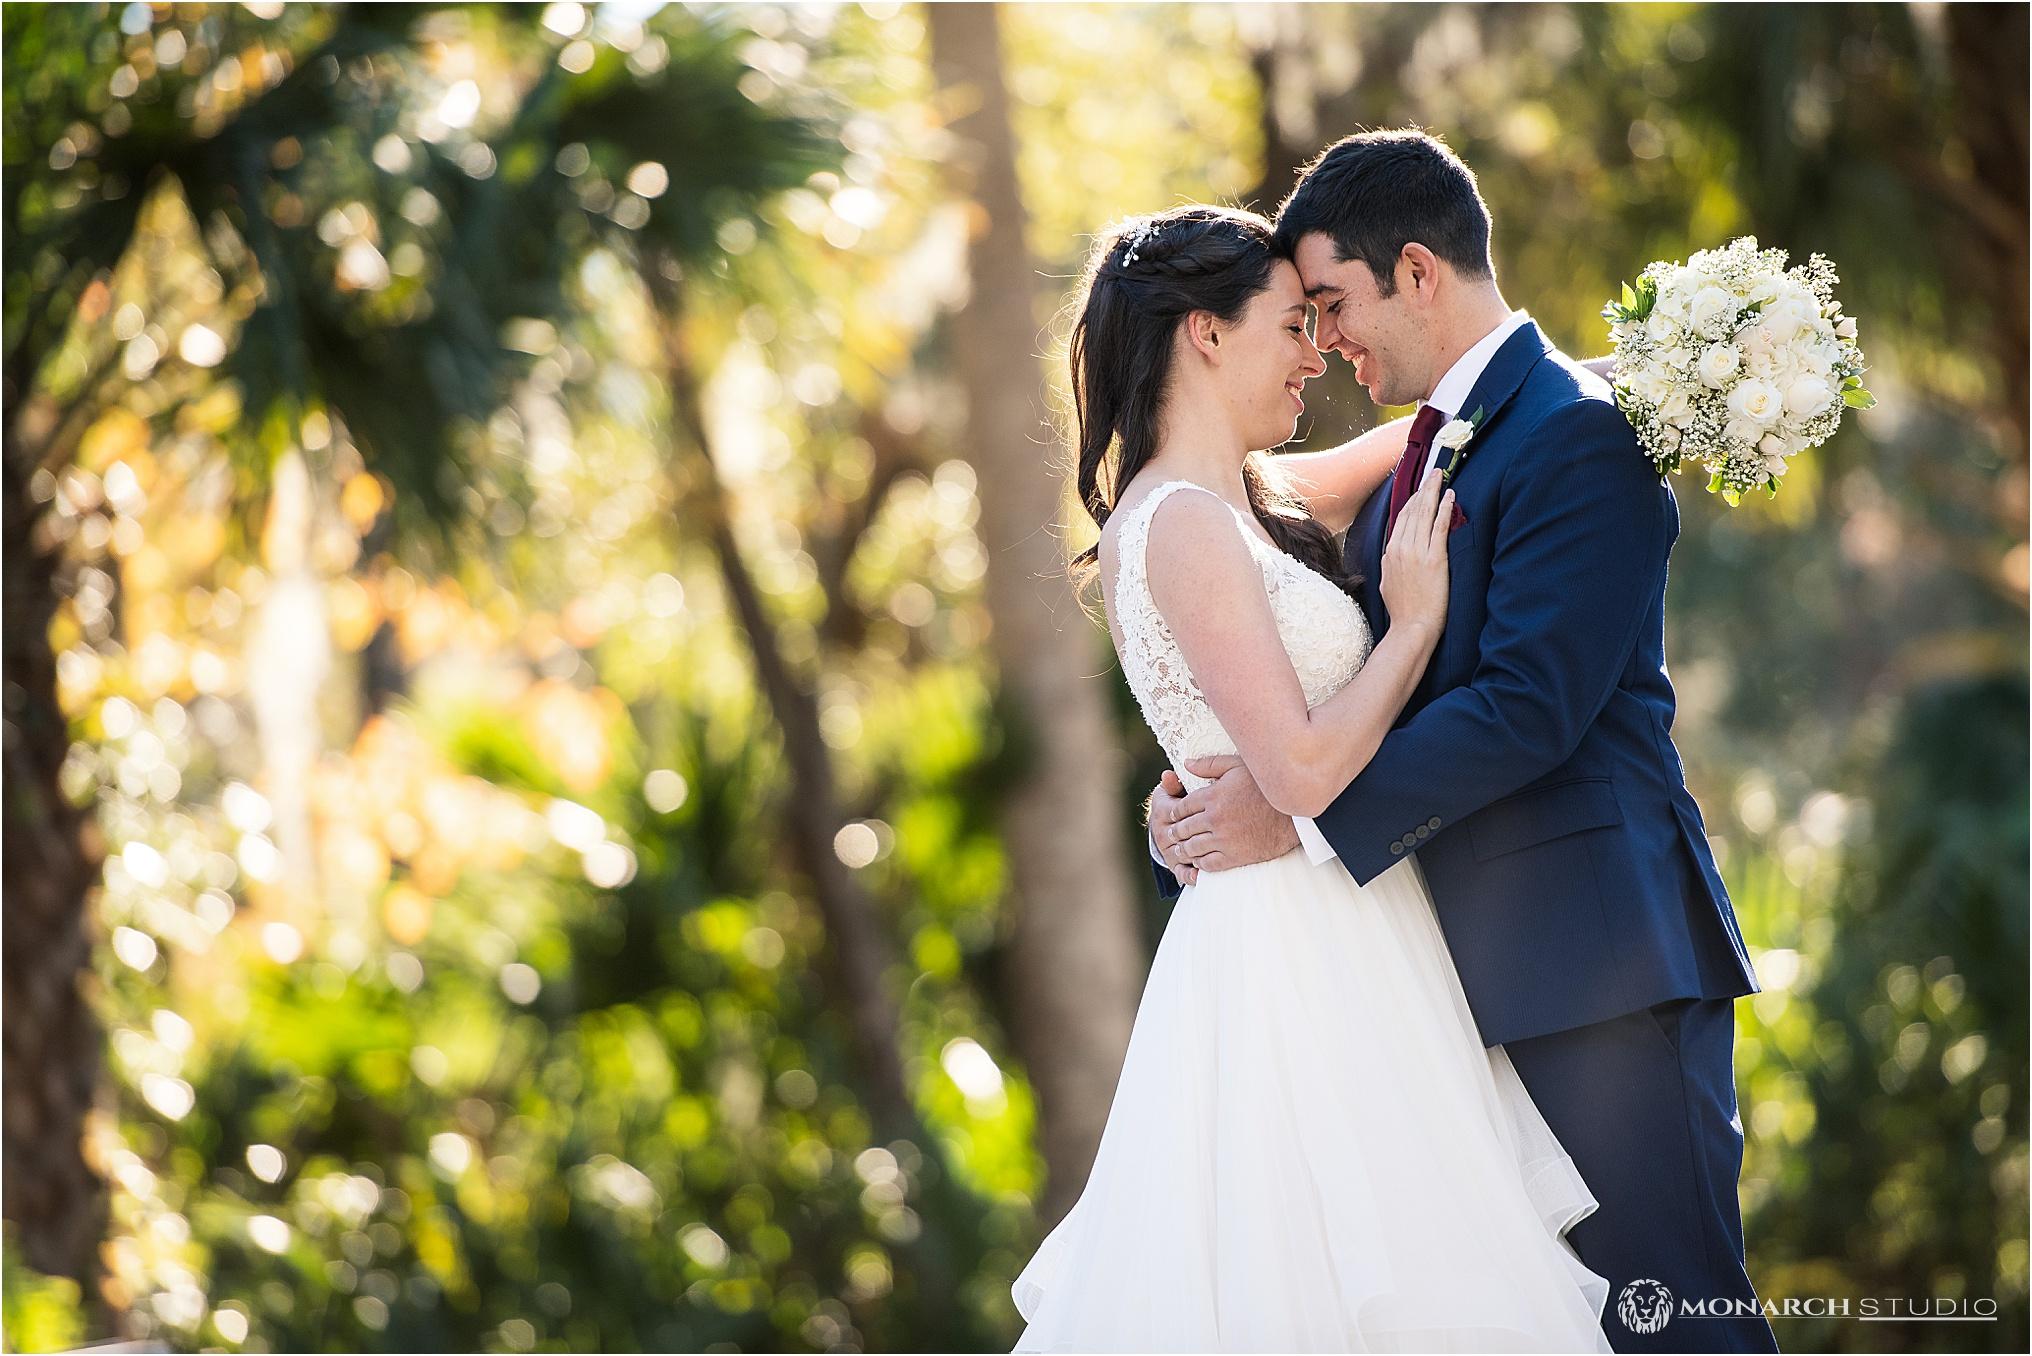 Wedding-photographer-in-sanford-florida-natural-wedding-025.jpg